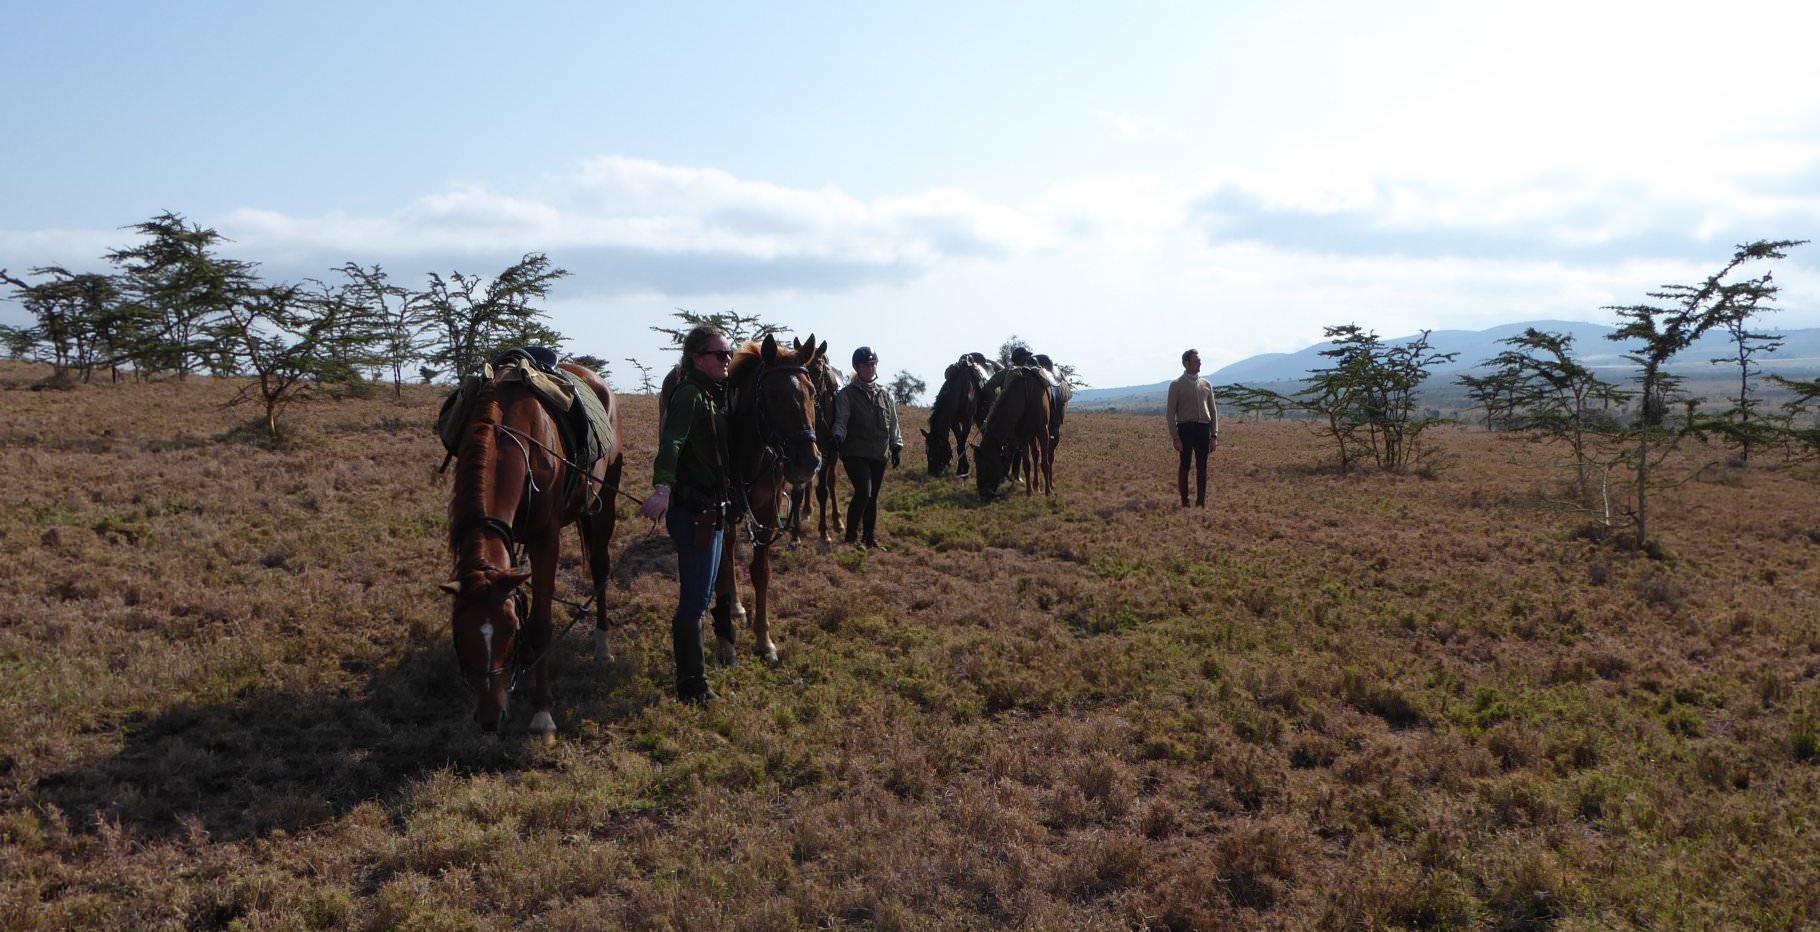 mobile riding safari, Travels in Tanzania, In The Saddle